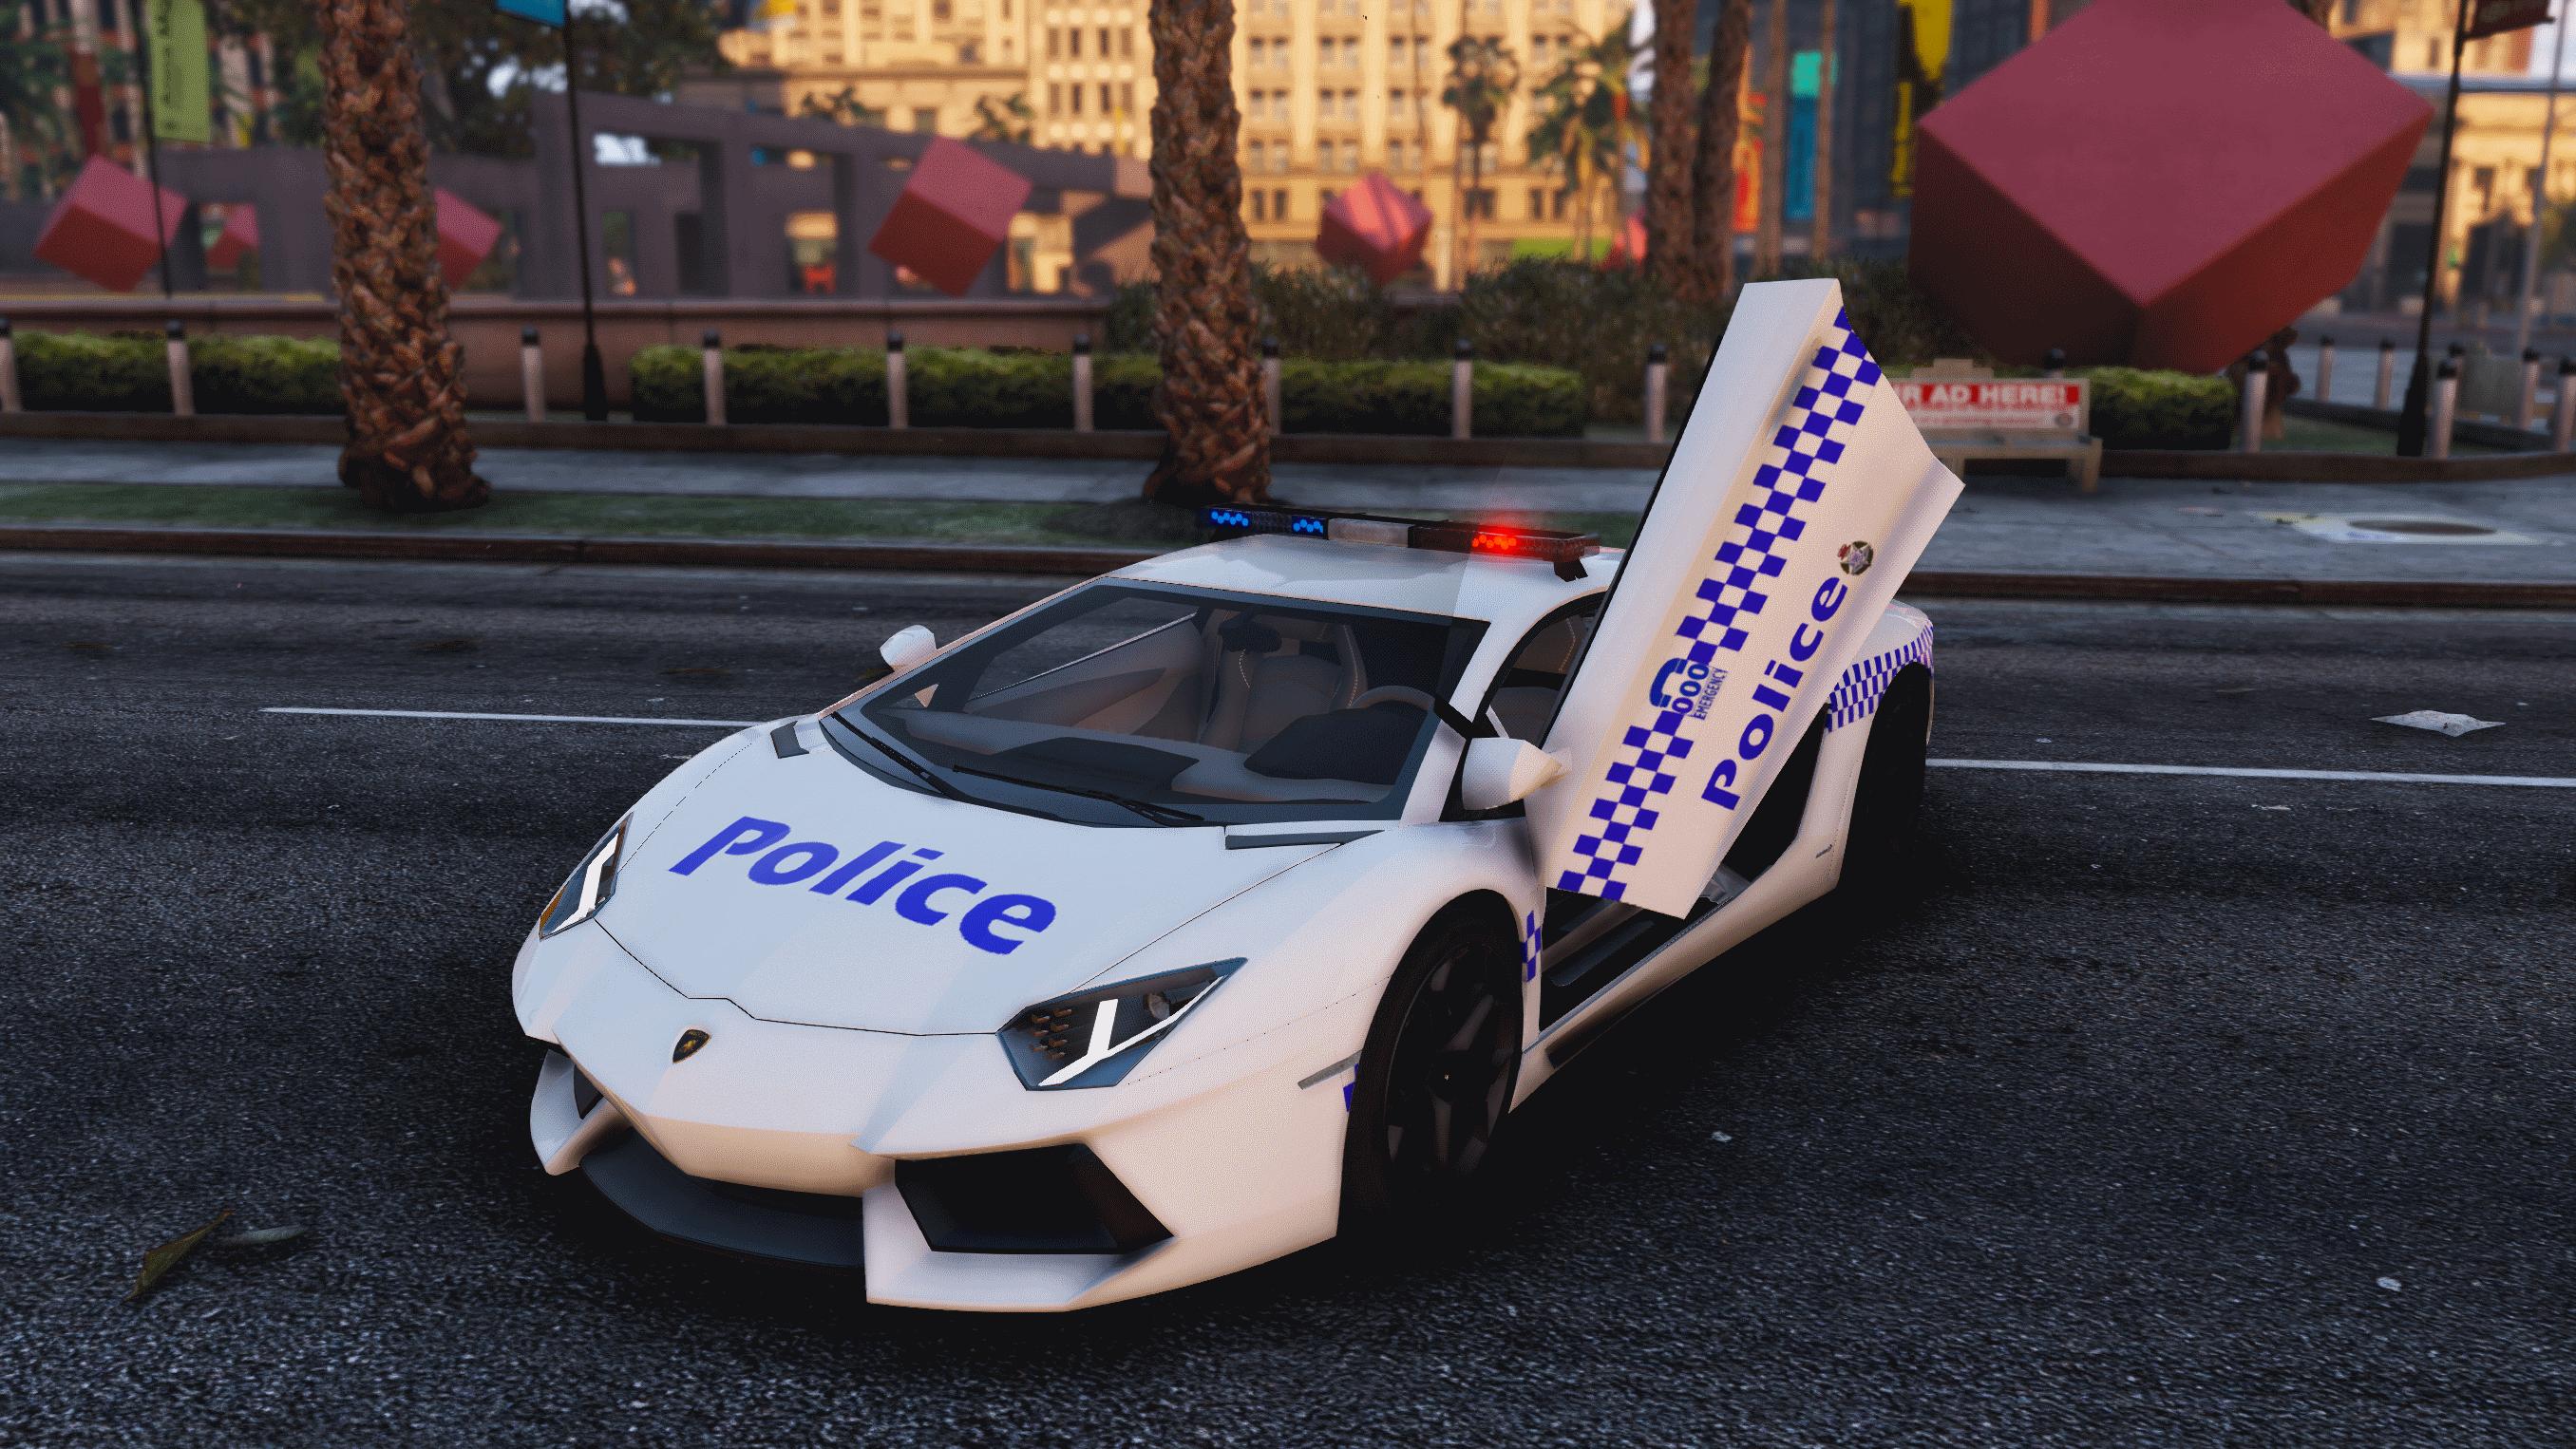 Australian Police Lamborghini Skin Victoria Gta5 Mods Com